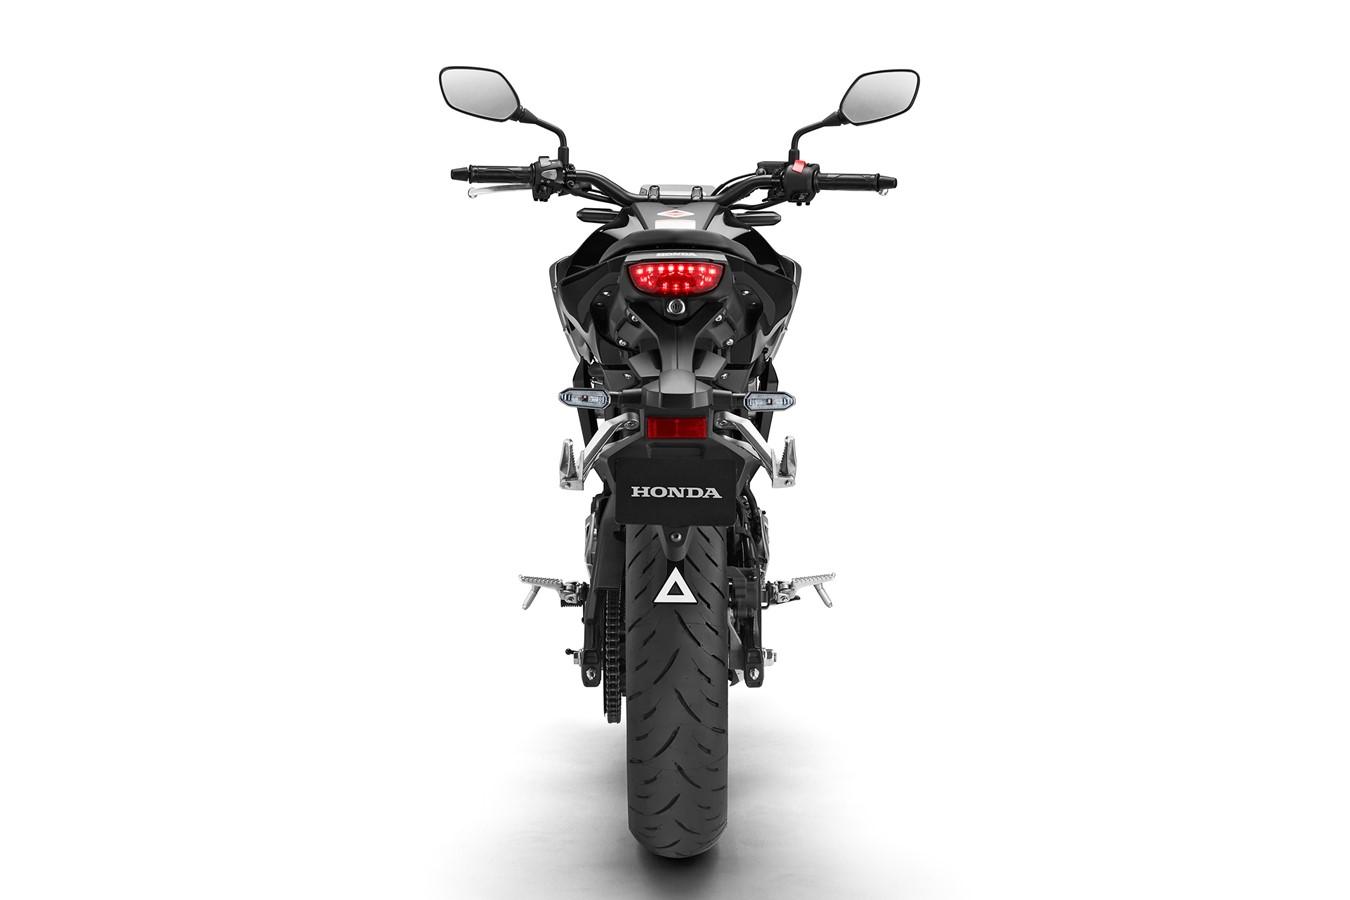 2018 Honda Cb125r Cb125 Wiring Diagram